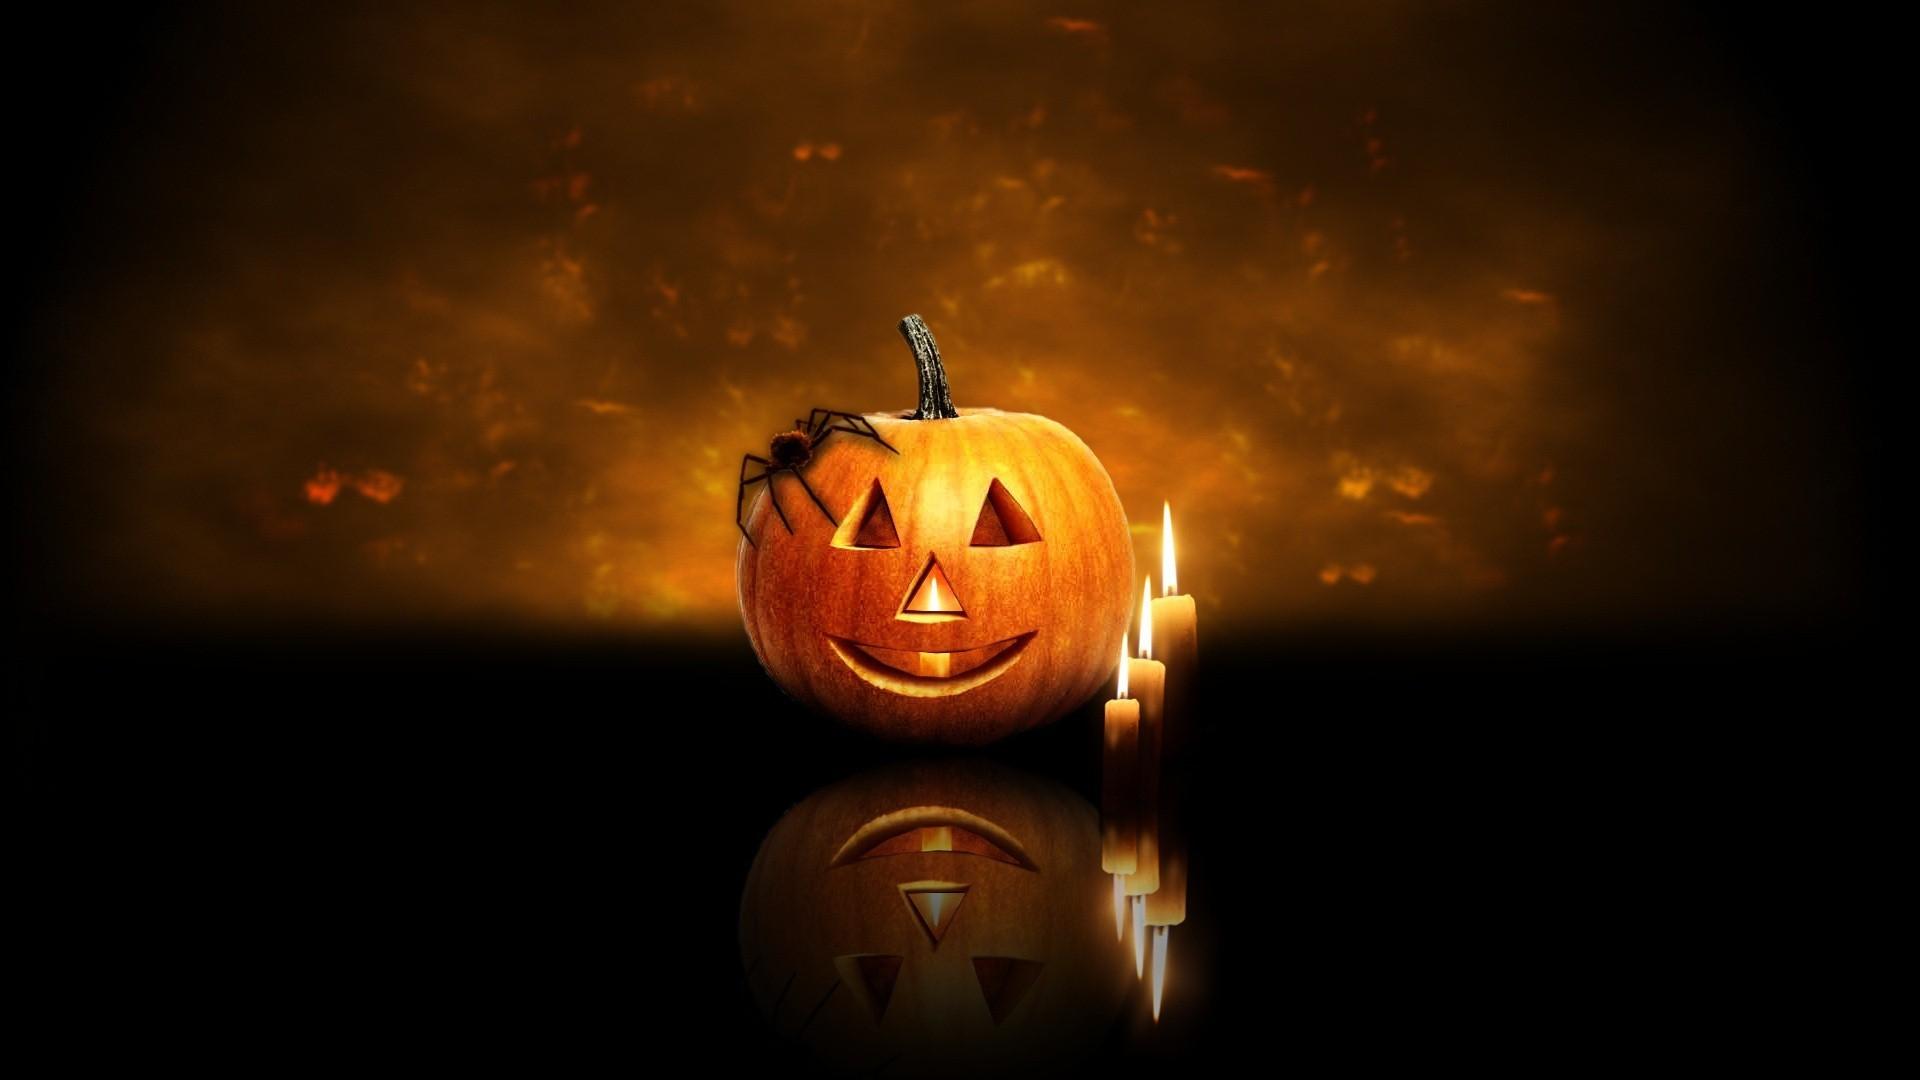 Pretty Halloween Wallpaper 52 Pictures